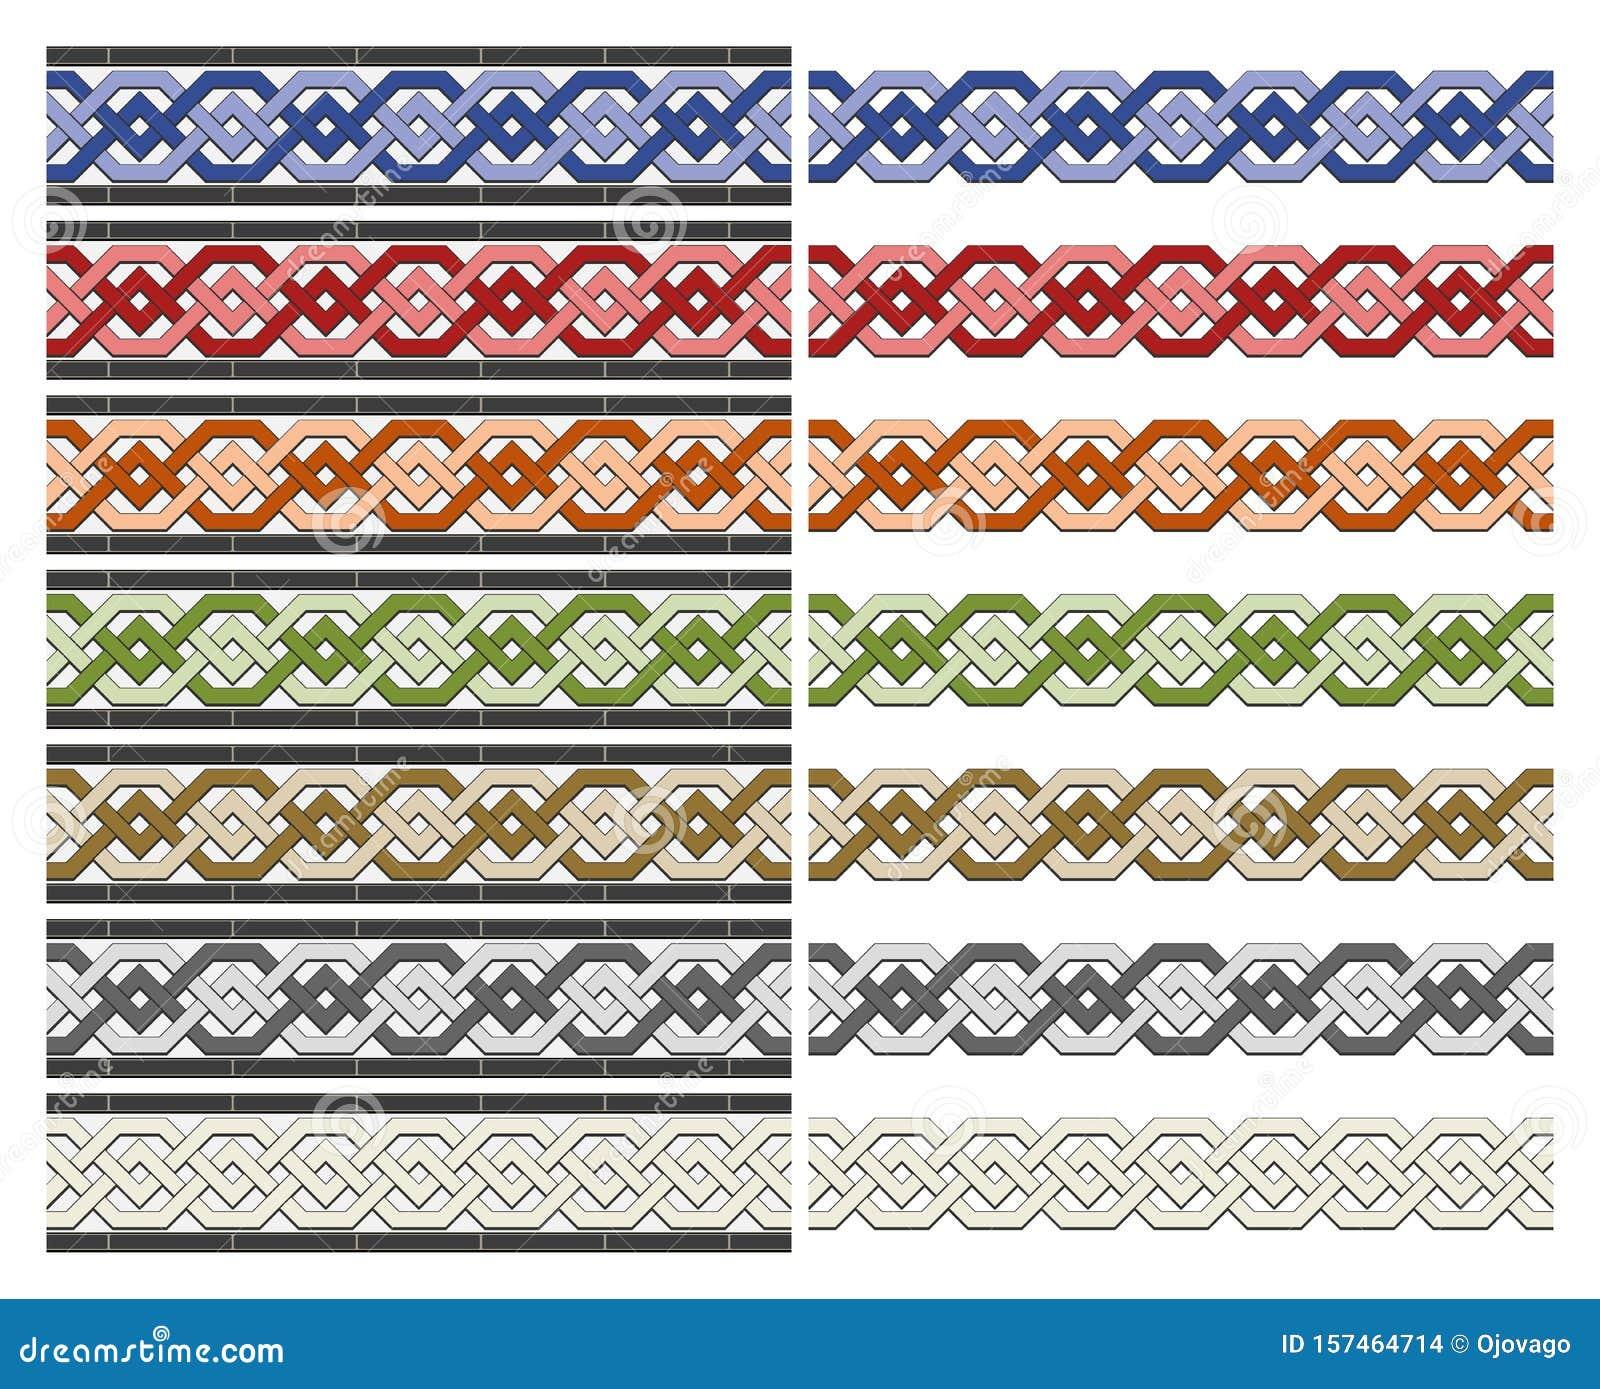 Arabic tiles seamless pattern